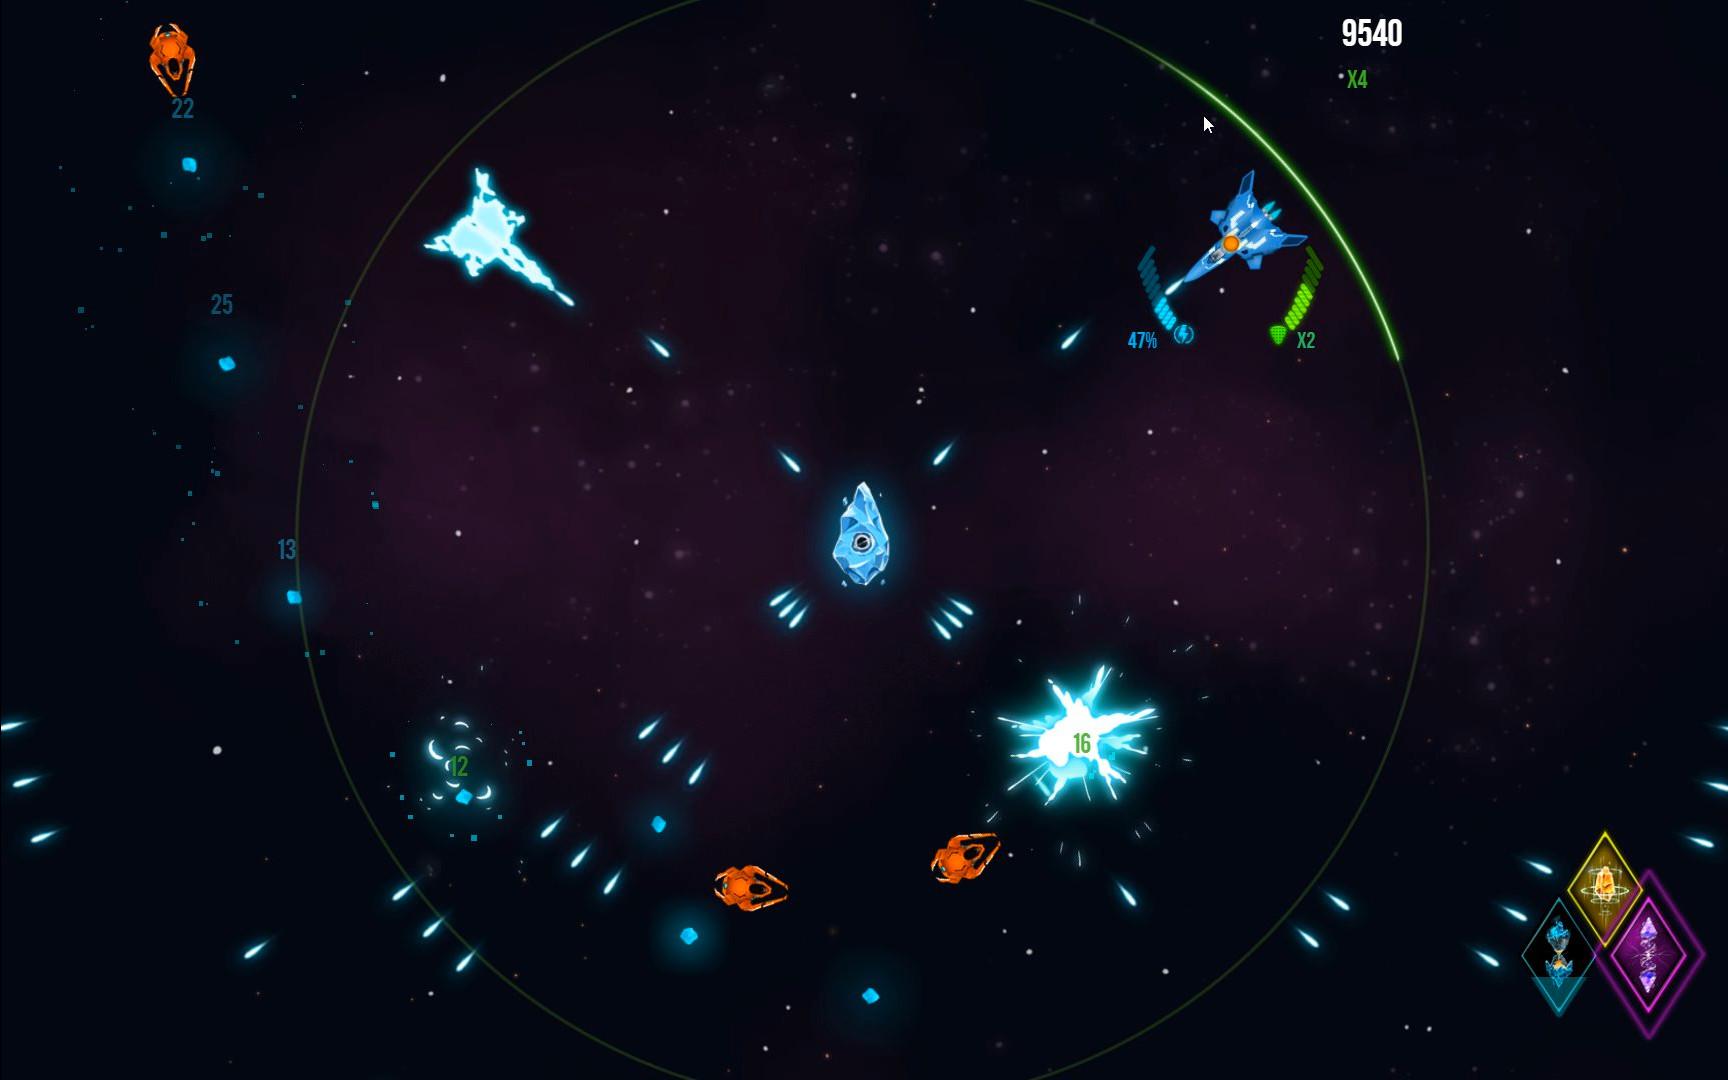 Download Prism Full Pc Game